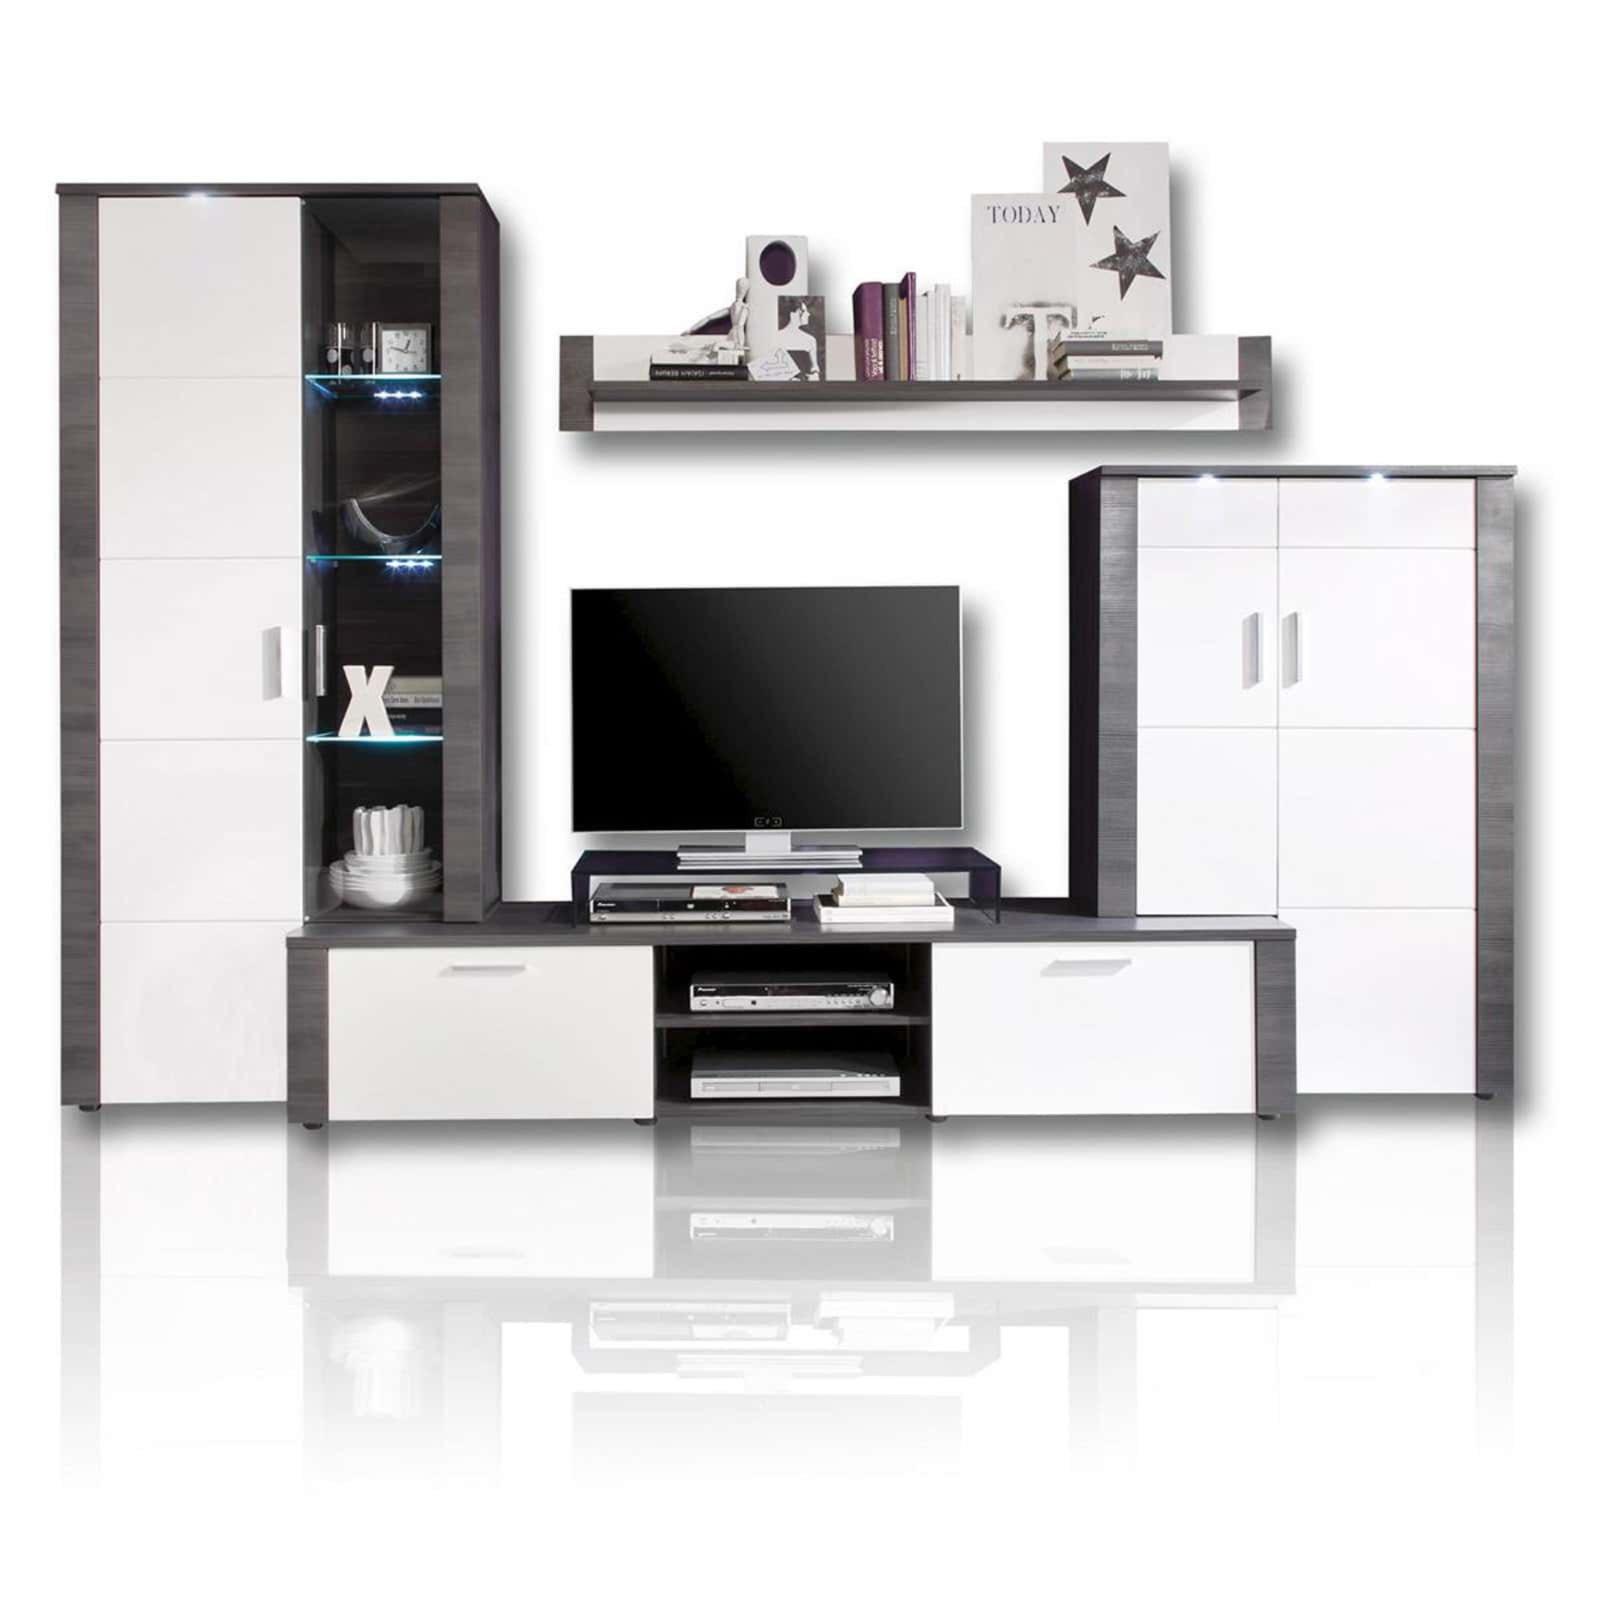 wohnwand xpress esche grau wei beleuchtung wohnw nde wohnw nde m bel roller. Black Bedroom Furniture Sets. Home Design Ideas